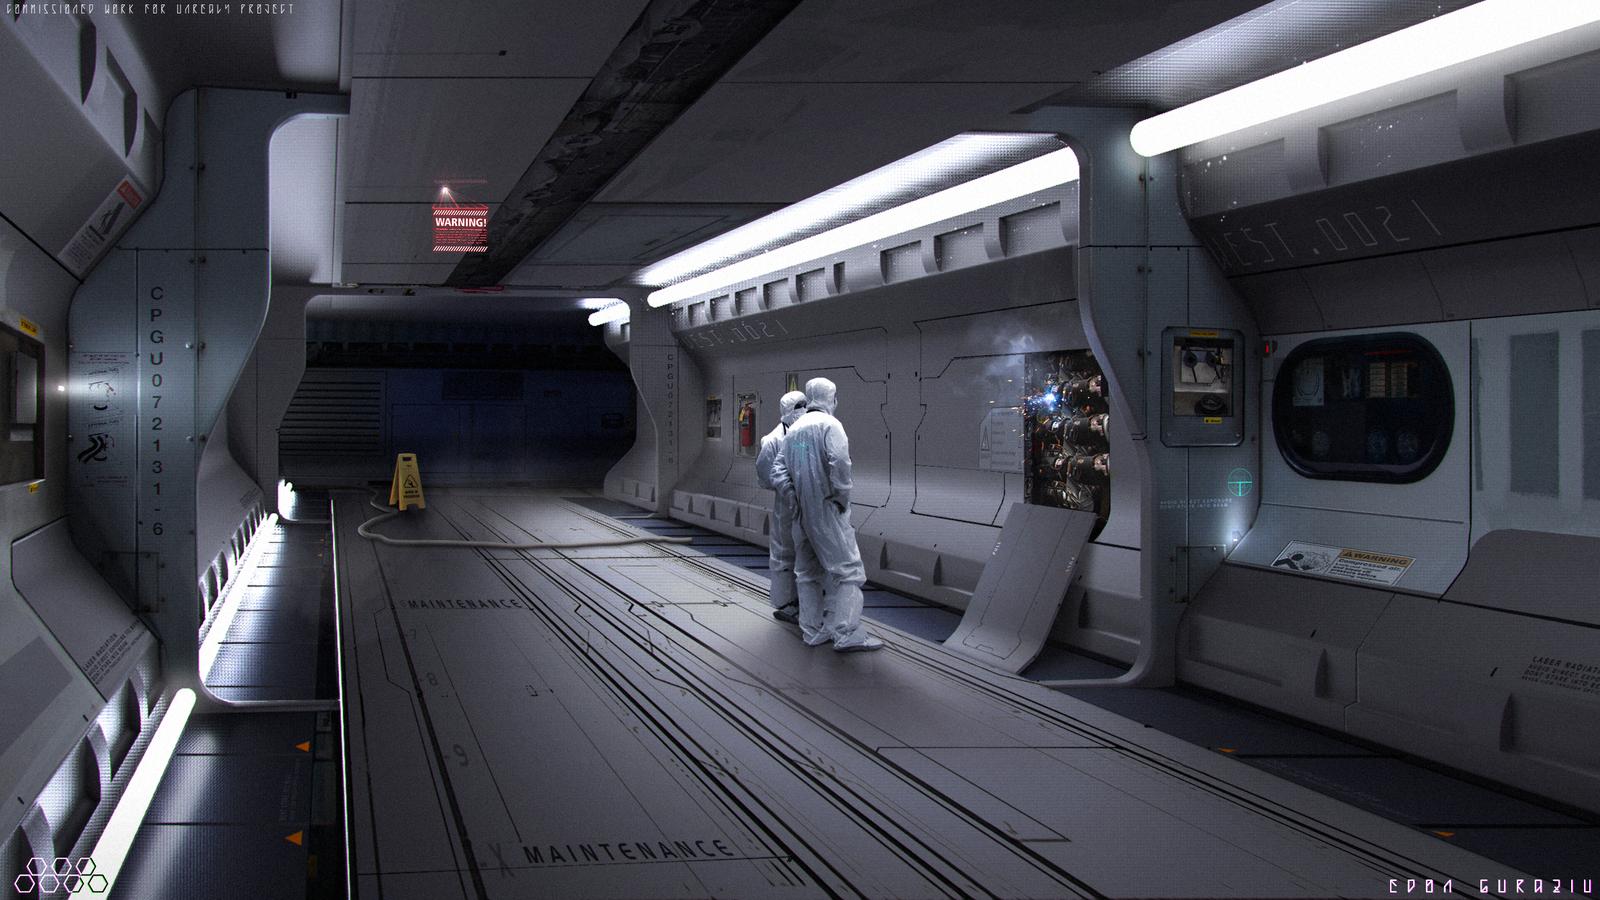 Futuristic Underground Base Google Search Base